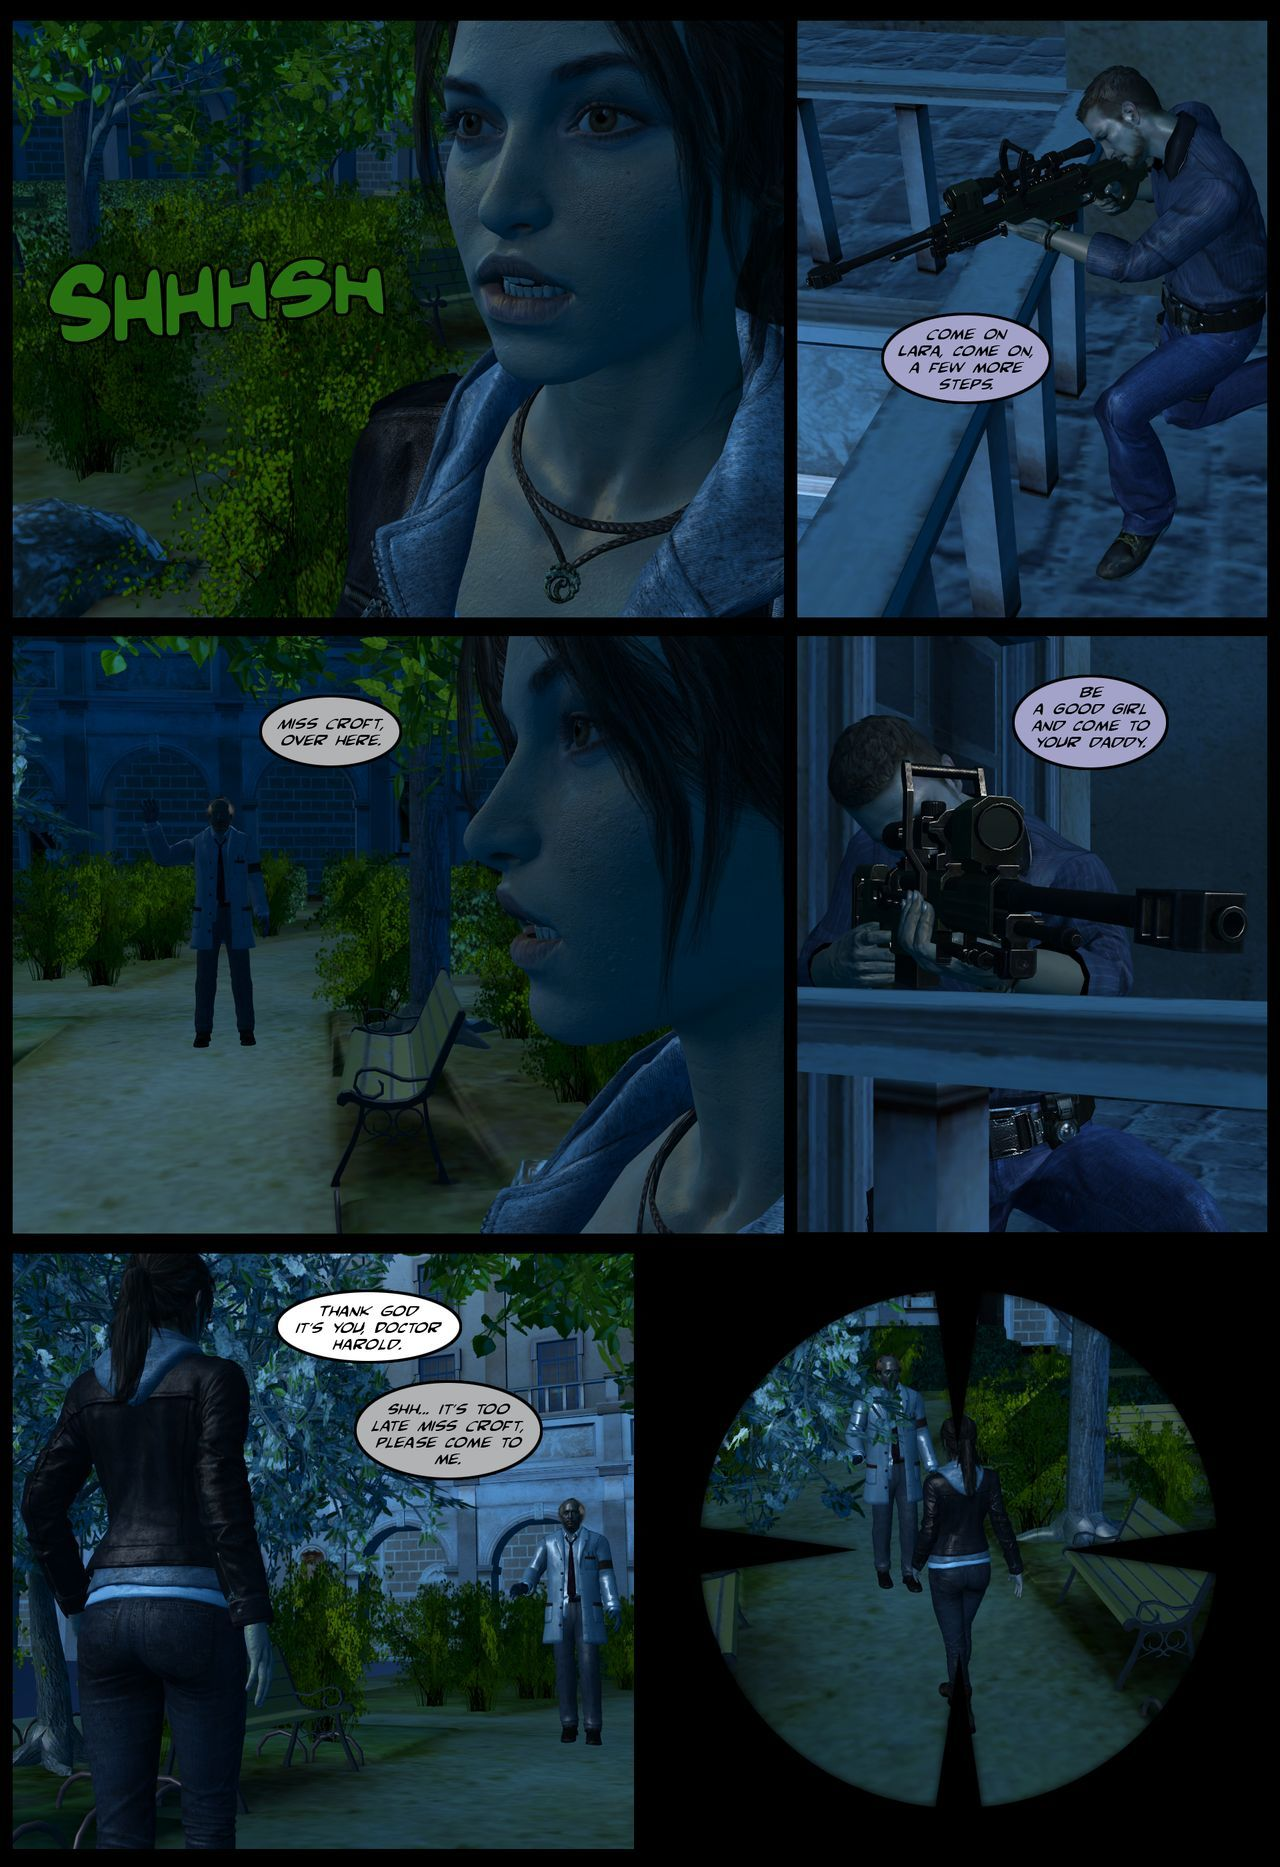 Adventures of Hostel - chapter 1-2 - part 4